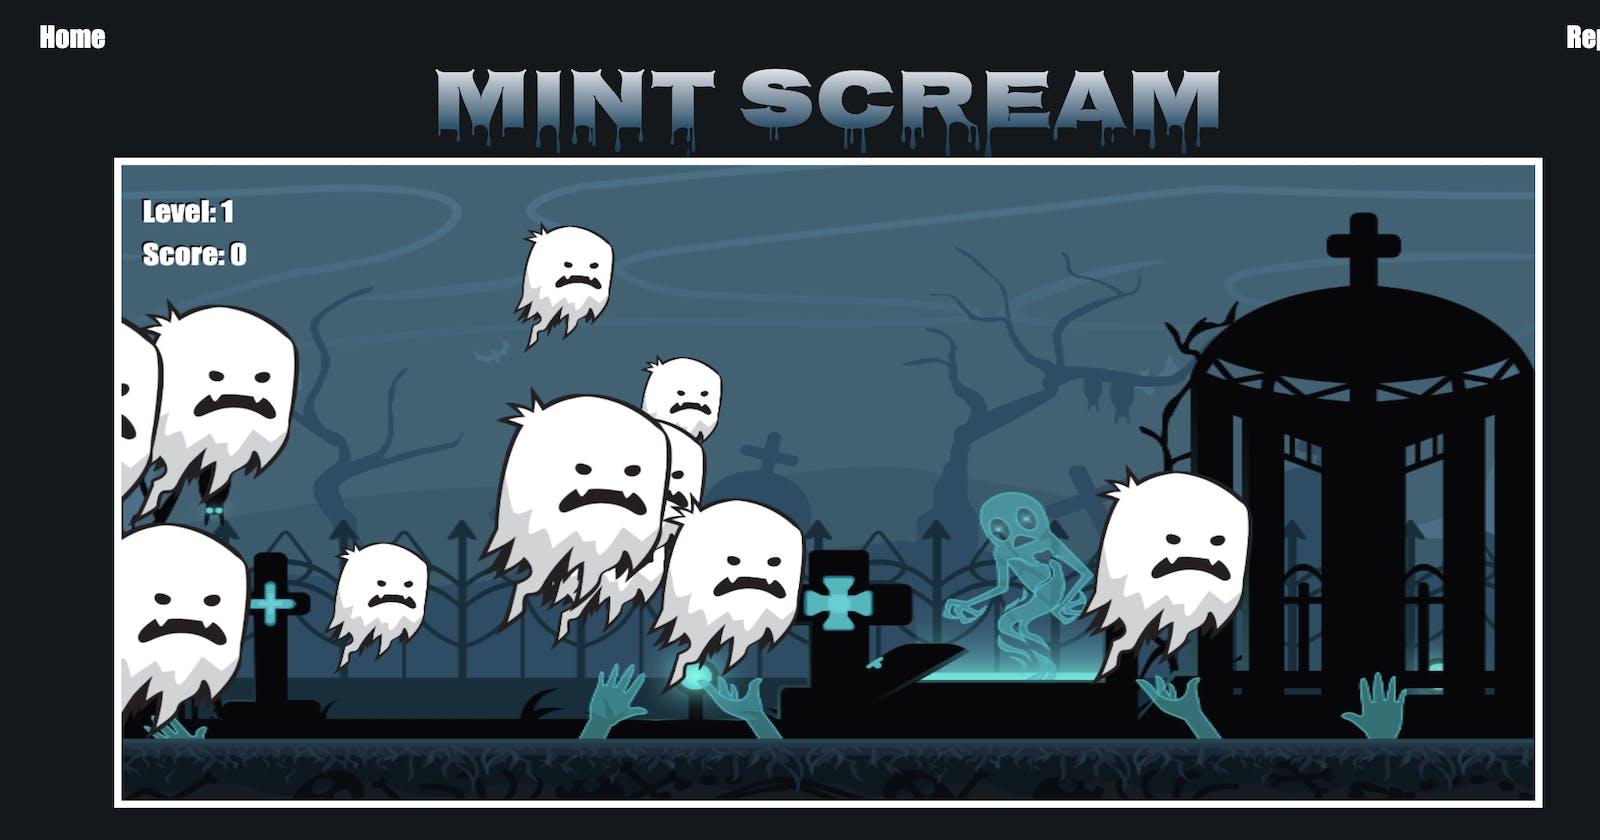 Mint Scream!